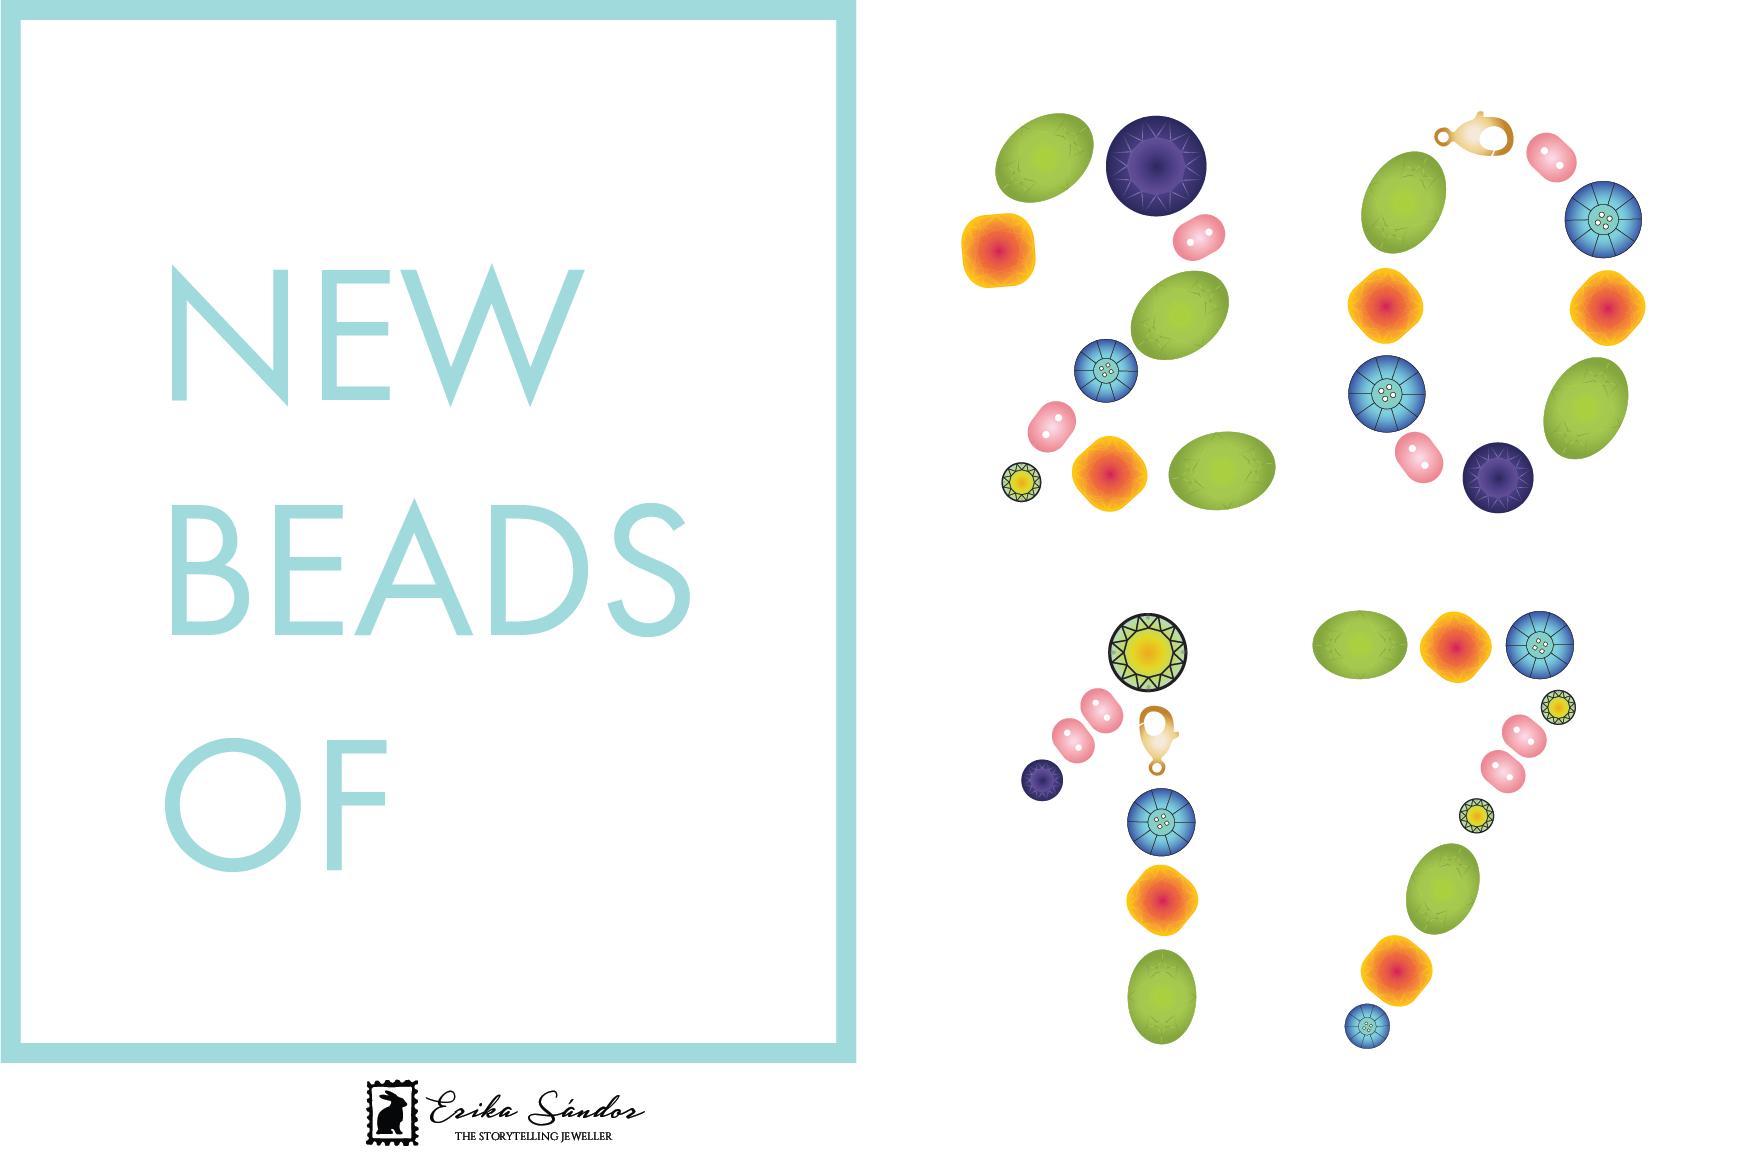 Czechmate Beam Beads Metallic Suede Light Green Glass 3-Hole Beads 30 Beads